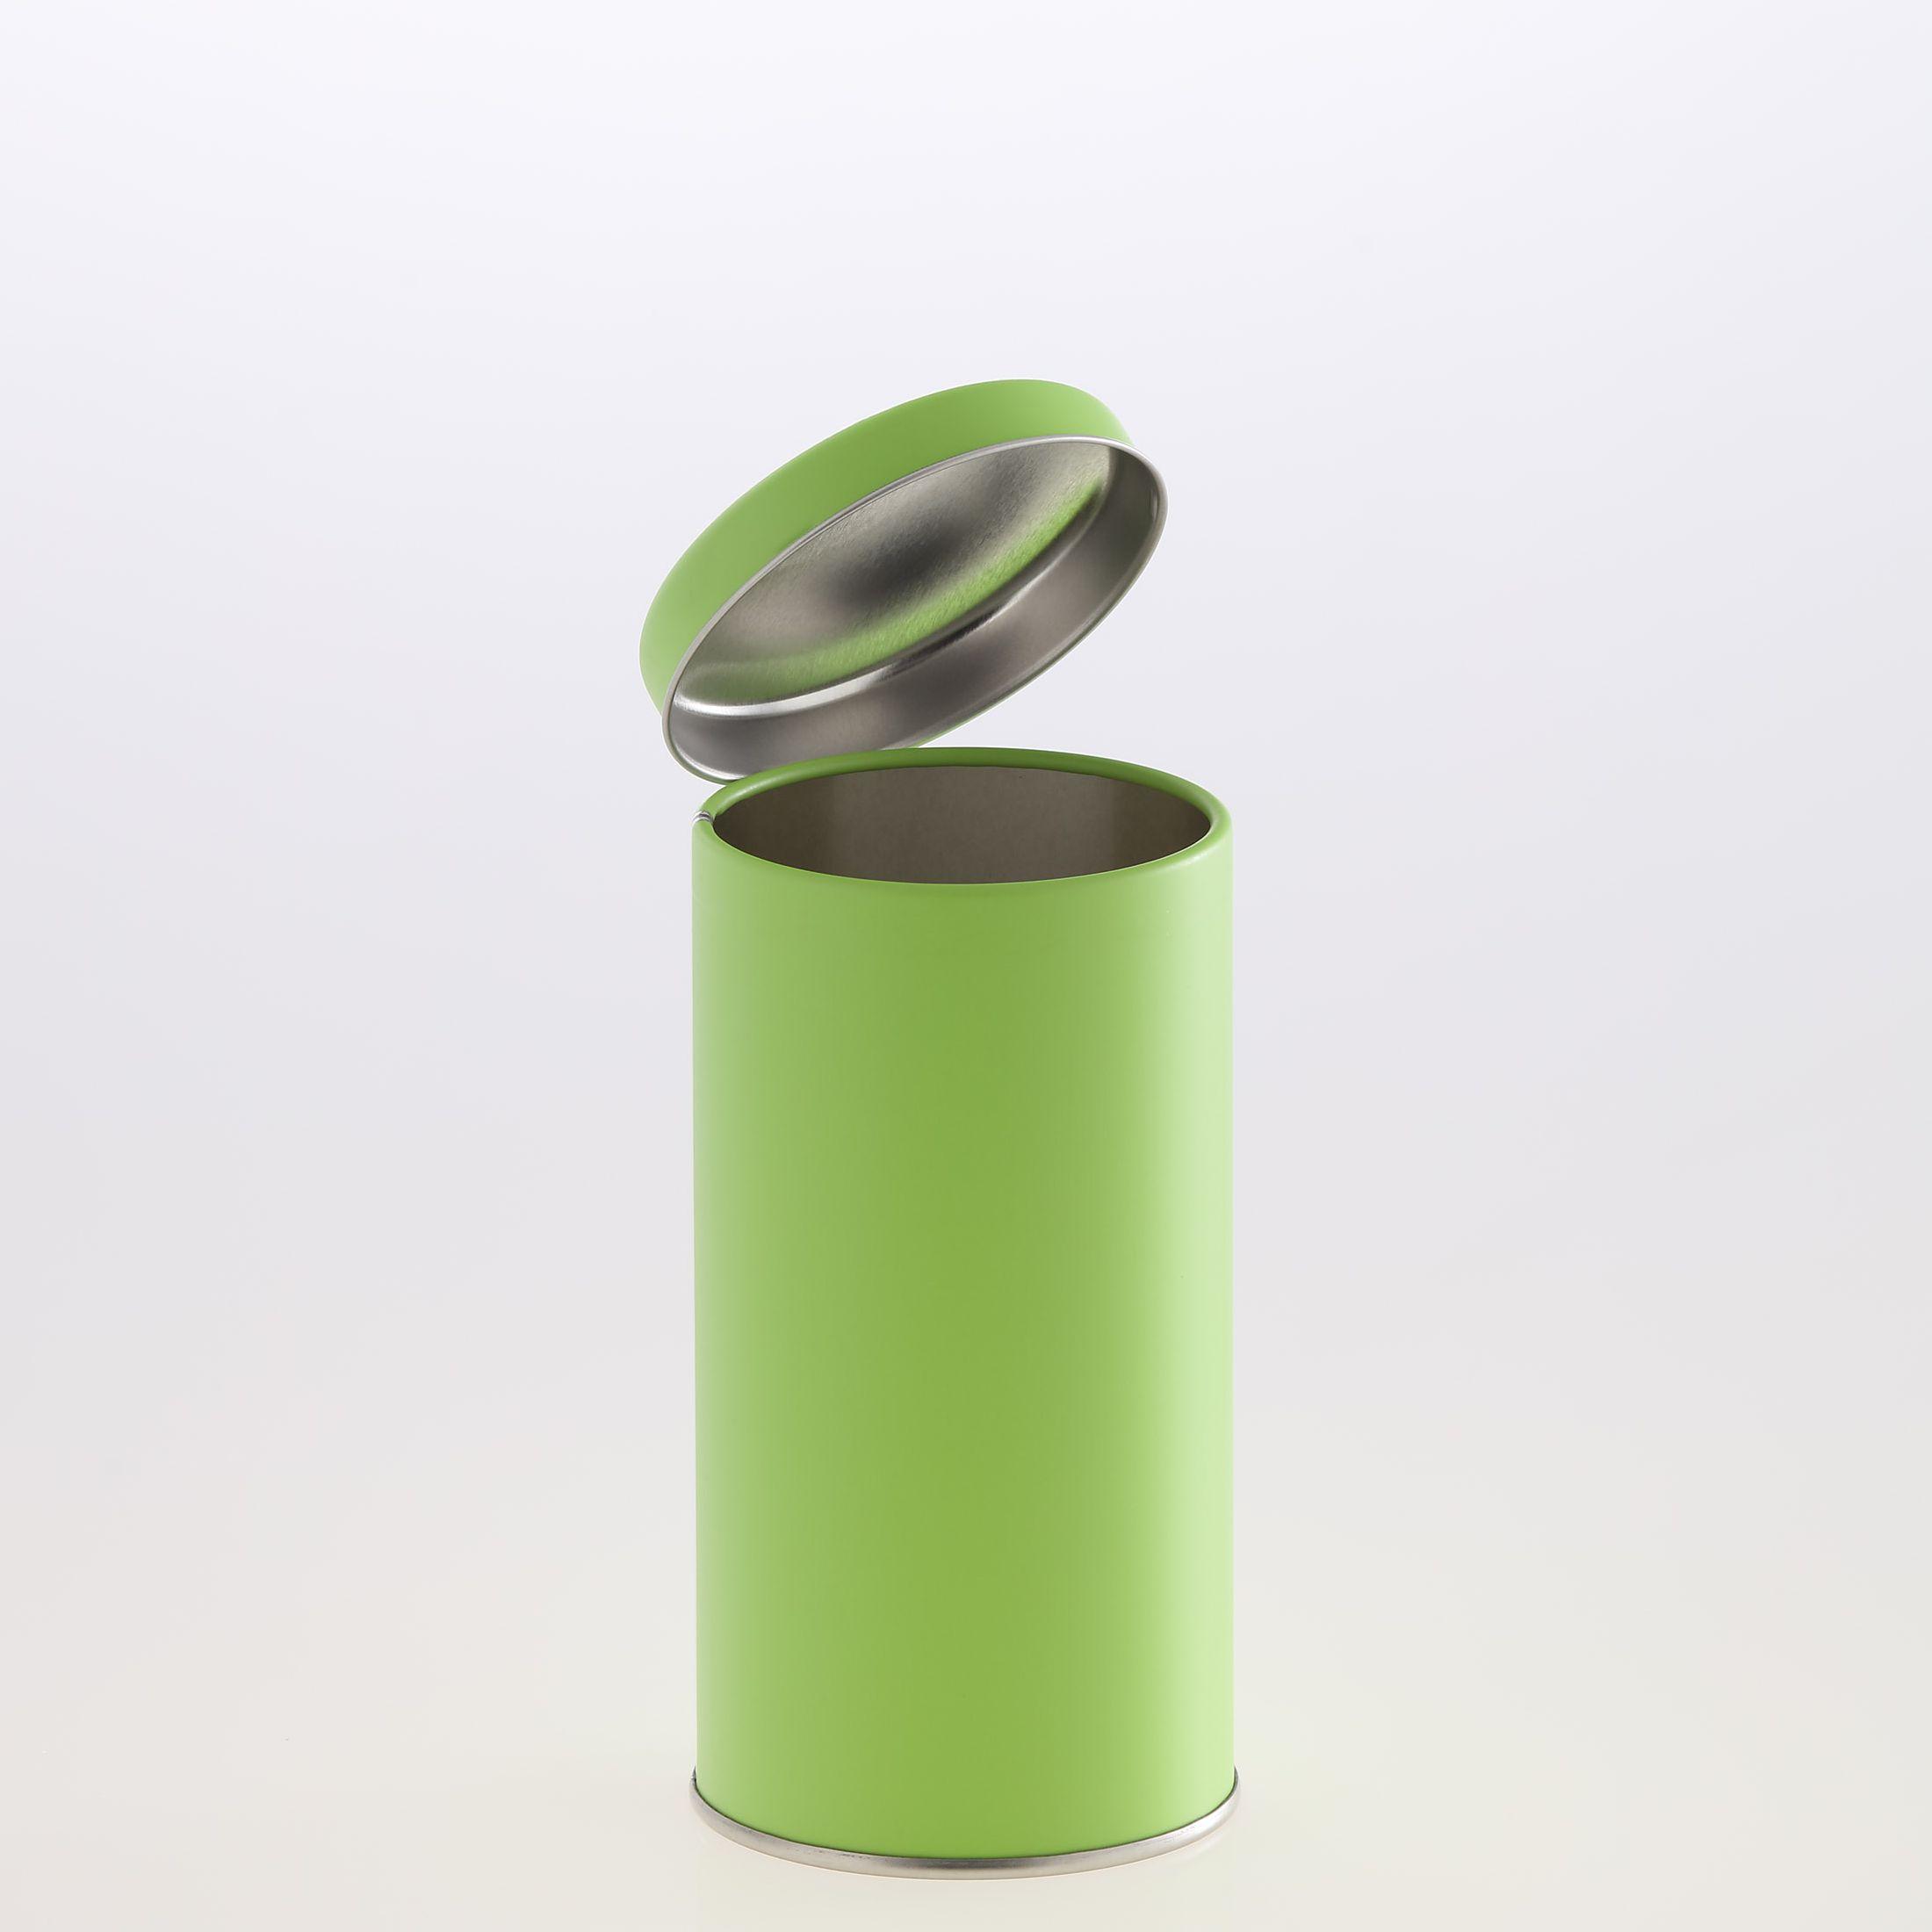 Stülpdeckeldose 73/140 grün 500 ml !Aktionspreis!